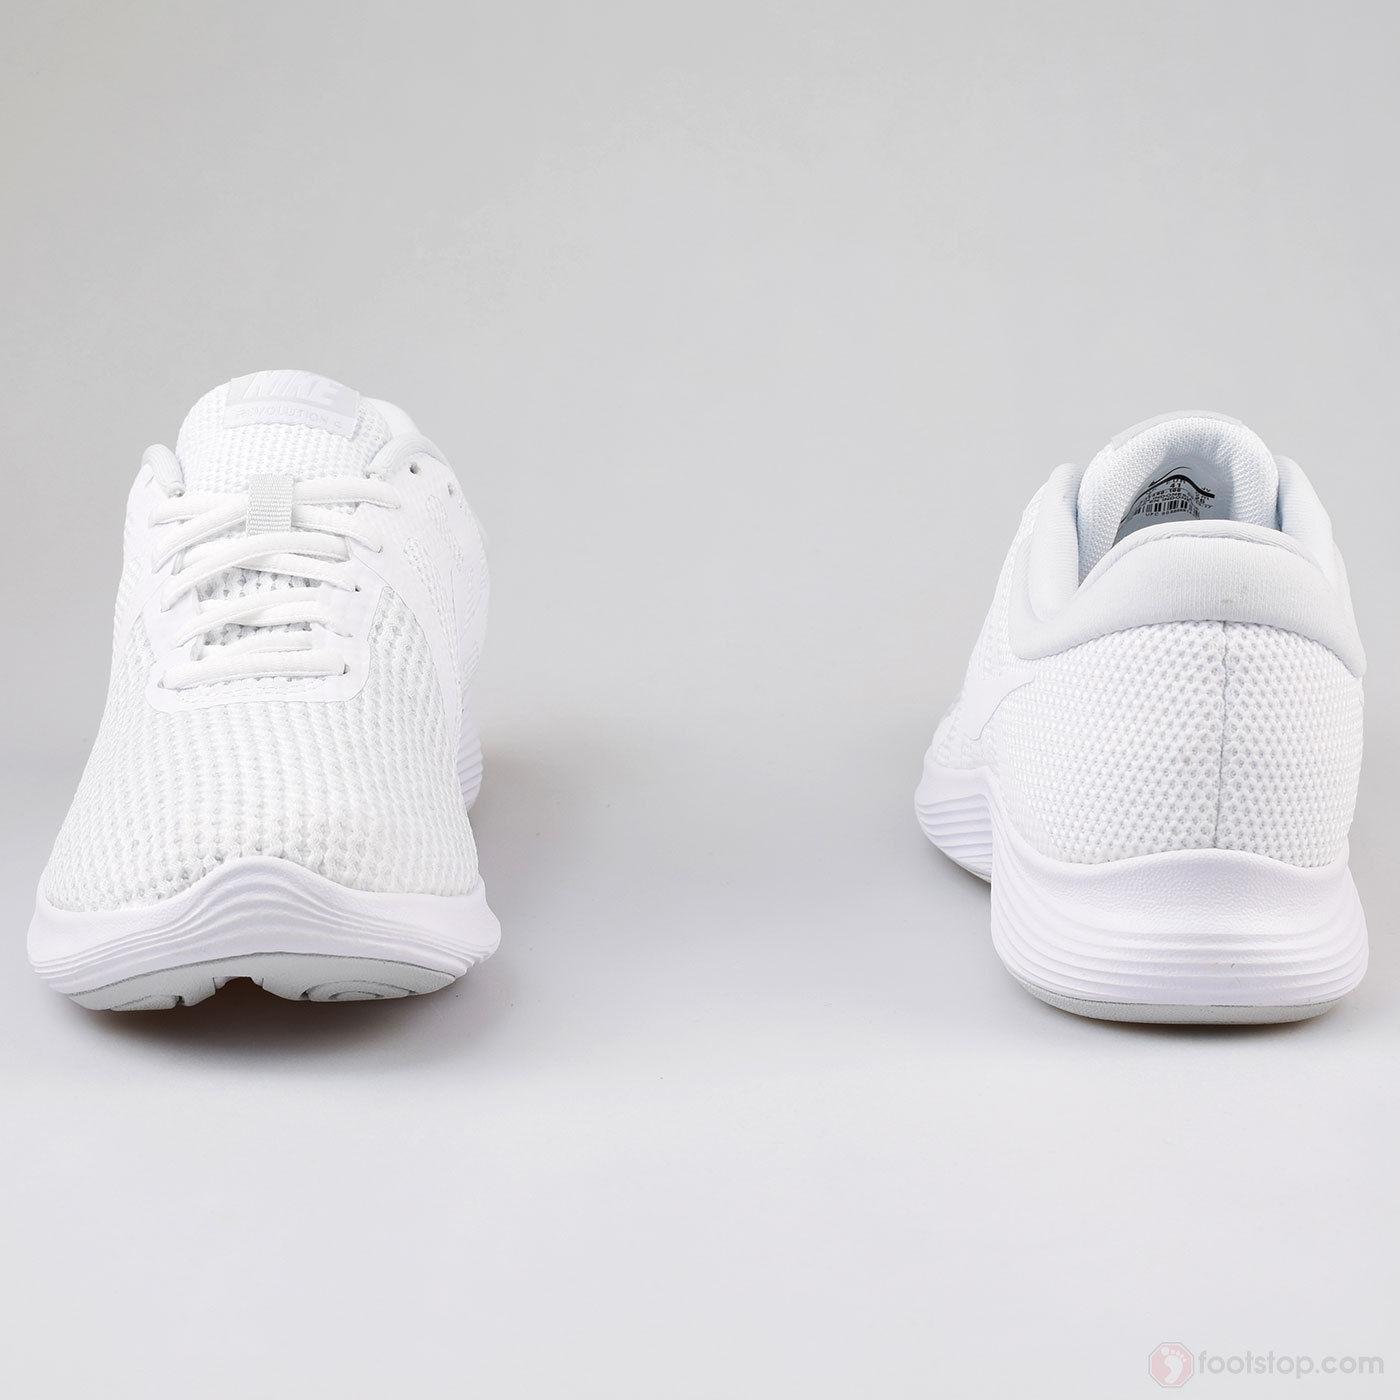 4df161f143291 Nike Revolution 4 Scarpe Sneakers Ginnastica Tennis Running 2018 Bianco Uomo